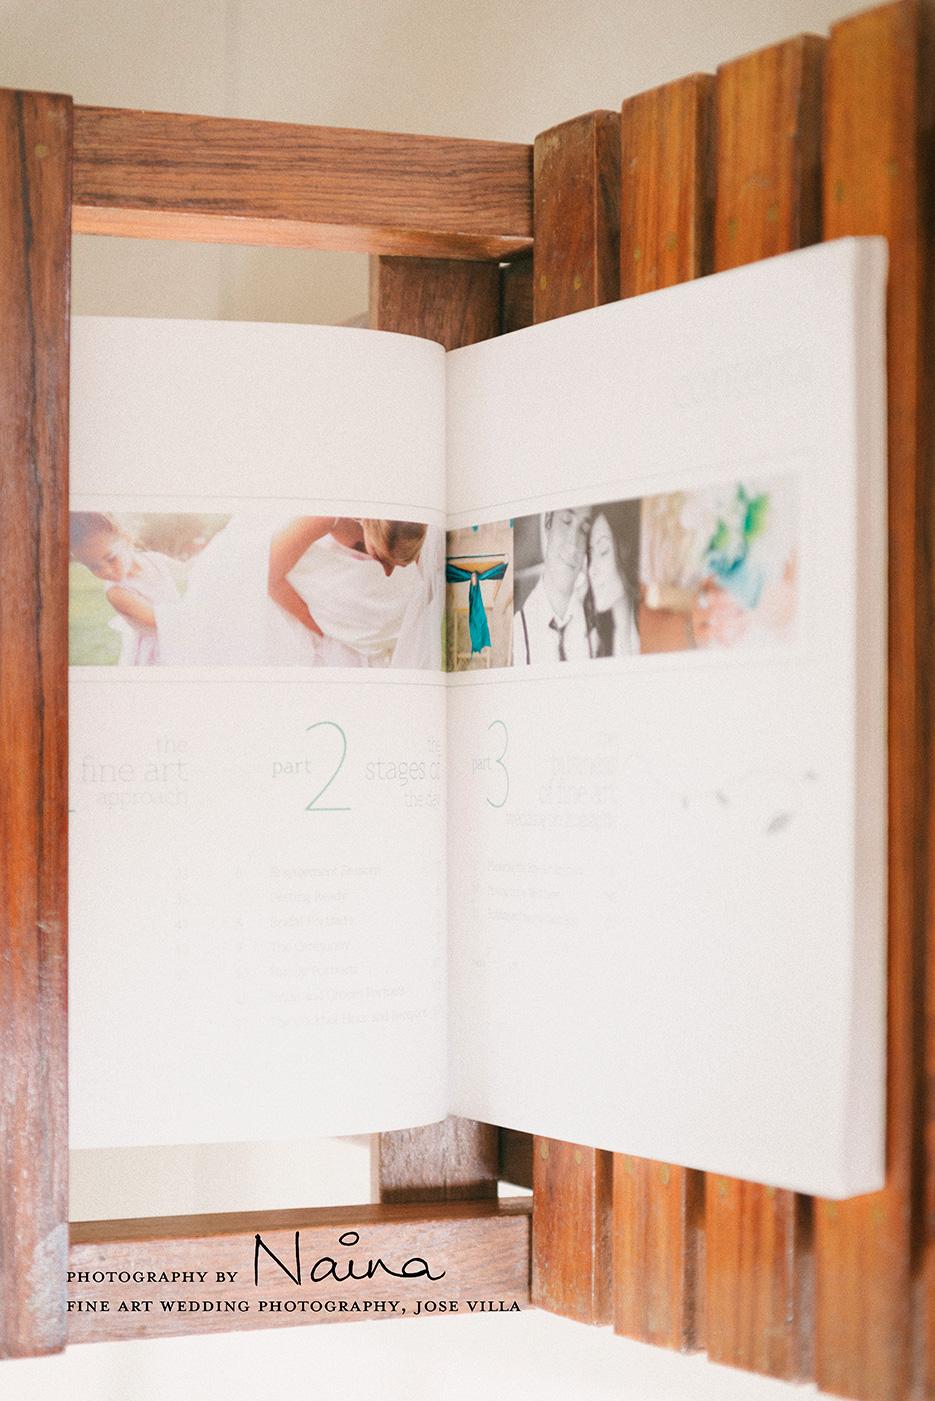 Fine Art Wedding Photography by Jose Villa & Jeff Kent. Photography Book Review. Photography by professional Indian lifestyle photographer Naina Redhu of Naina.co